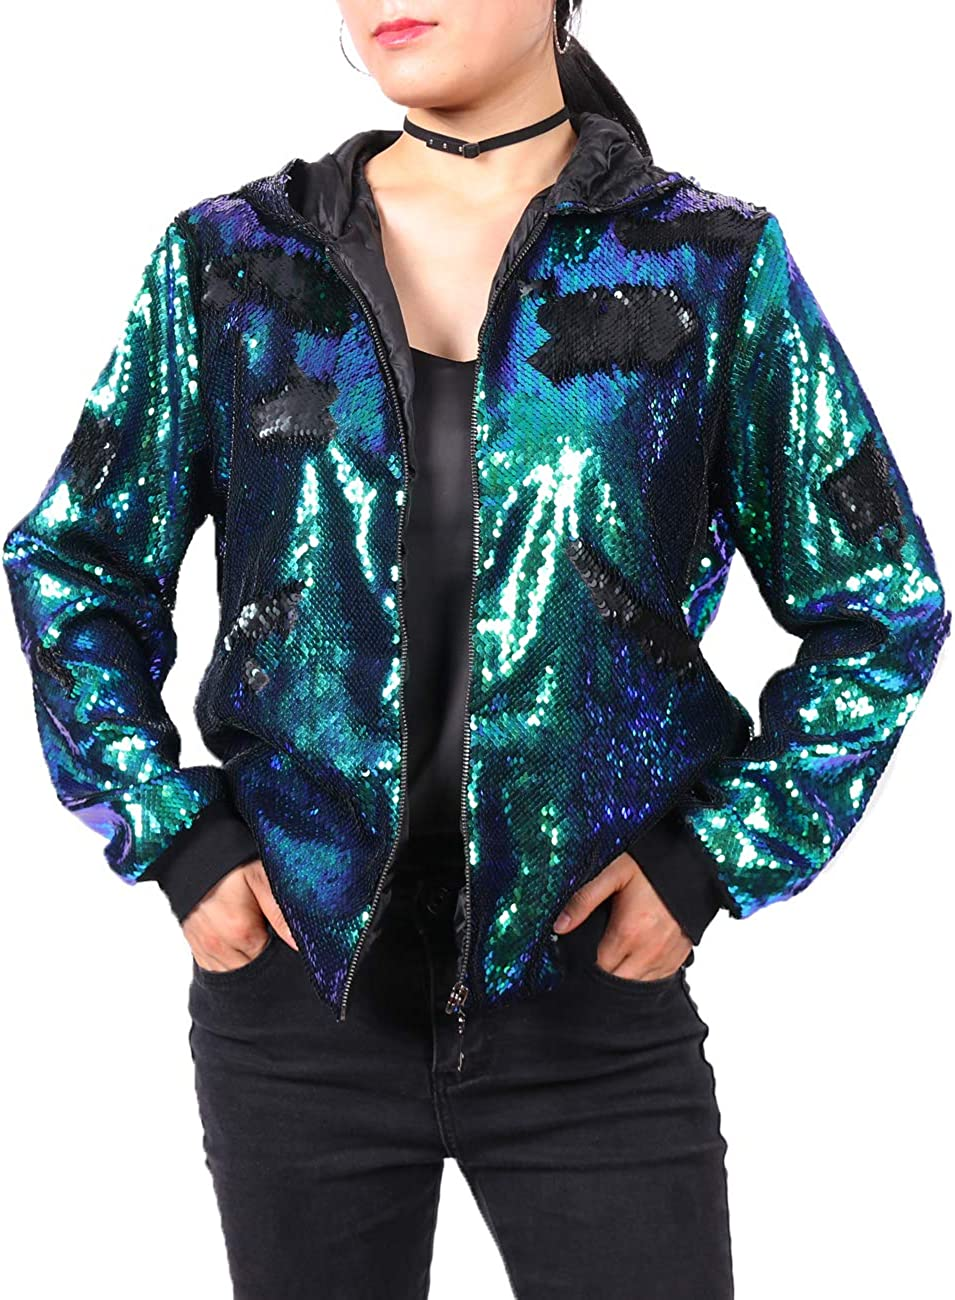 A ARFAR Women Sequin Jackets Bomber Hoodie Coat Flip Virginia Under blast sales Beach Mall Jack